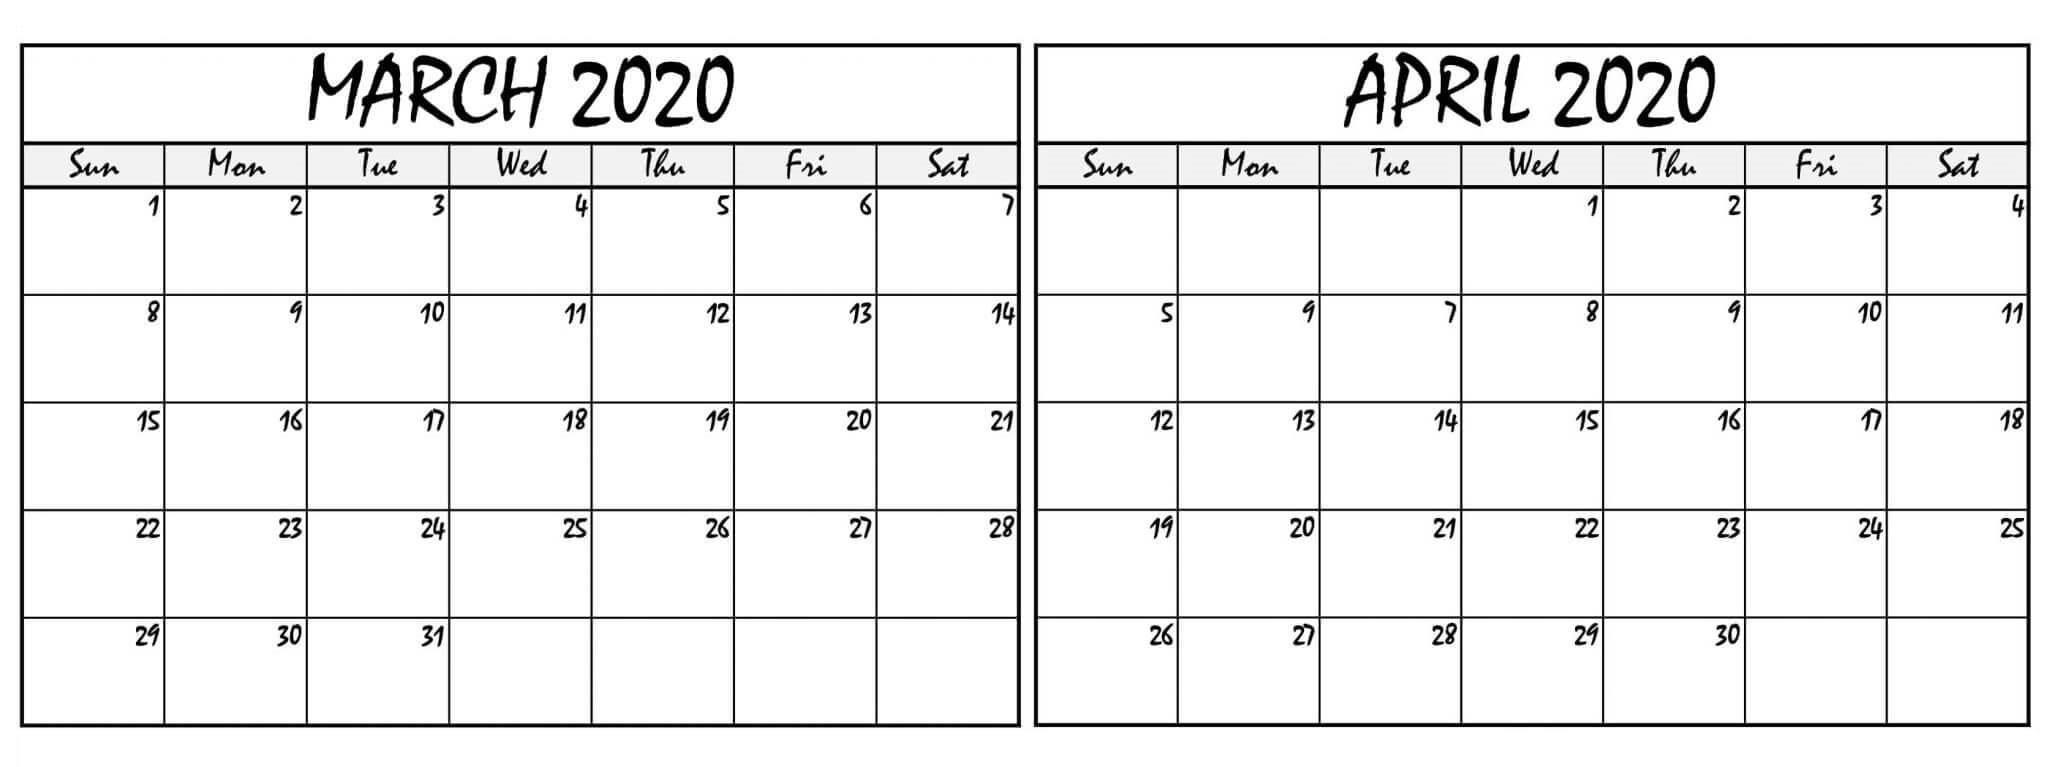 March April 2020 Calendar Pdf With Notes – 2019 Calendars Printable Calendar I Can Edit